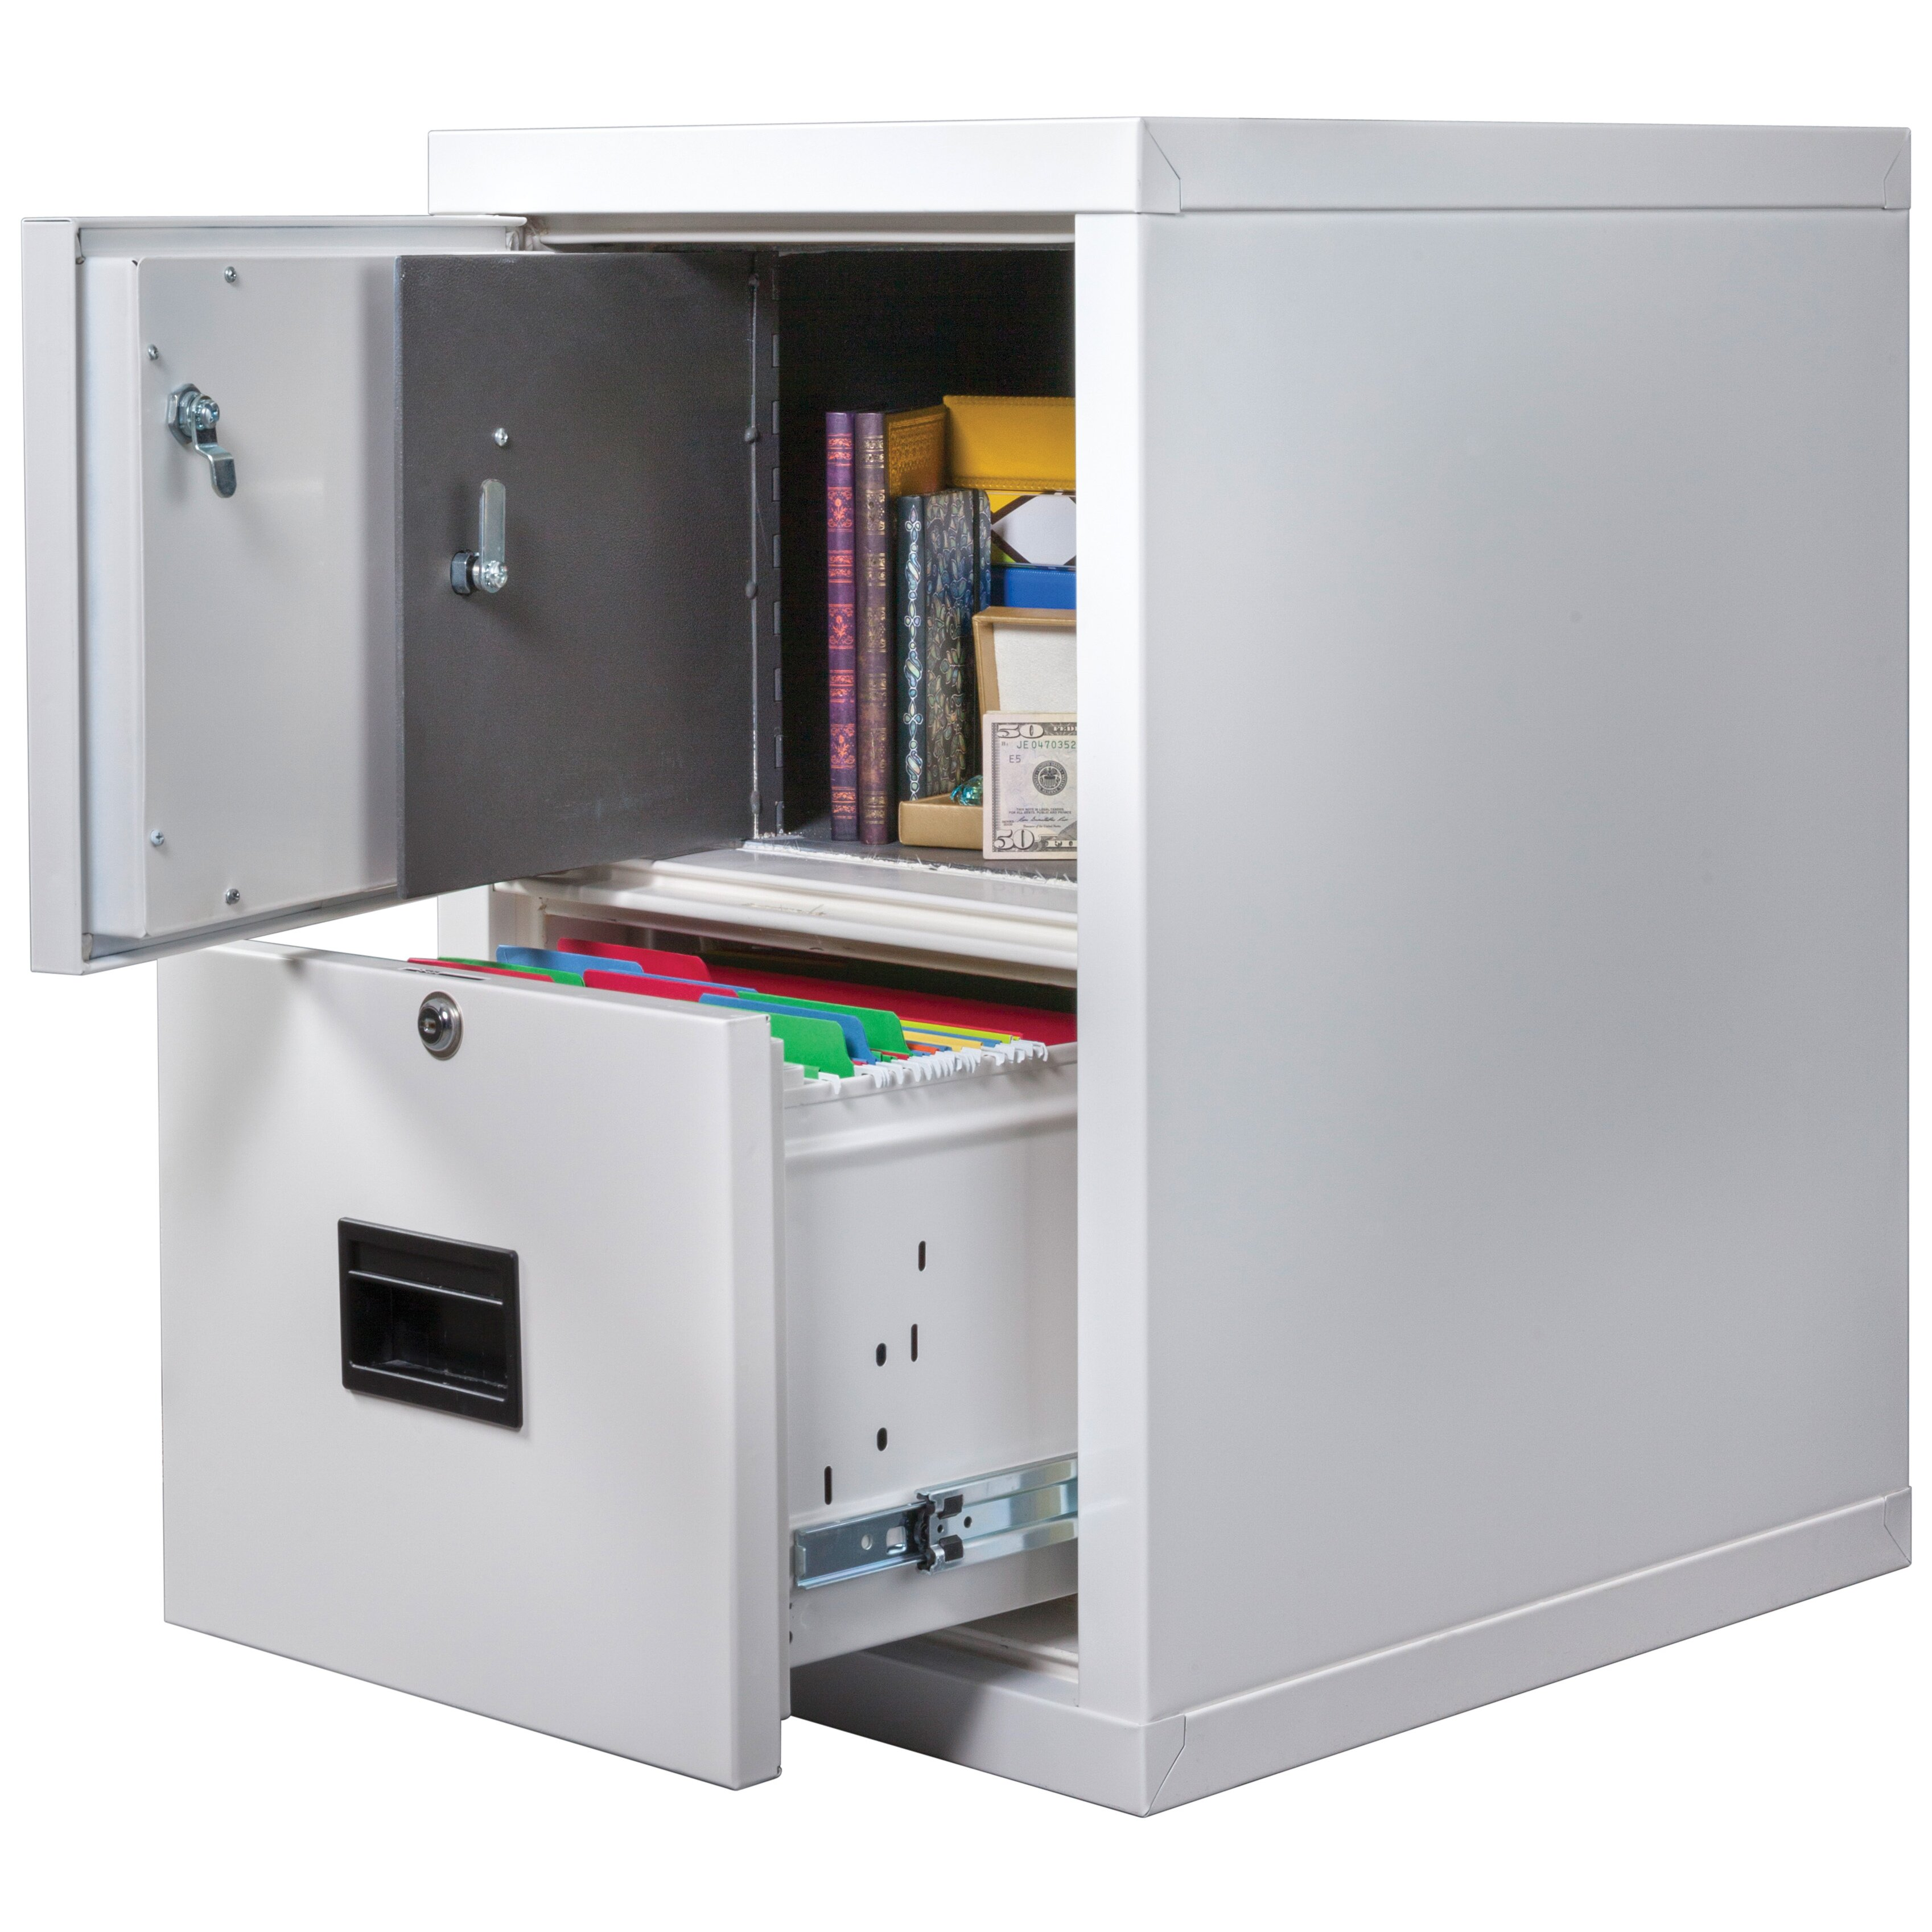 fireking turtle safe in a file fireproof vertical file cabinet safe with key lock wayfair. Black Bedroom Furniture Sets. Home Design Ideas